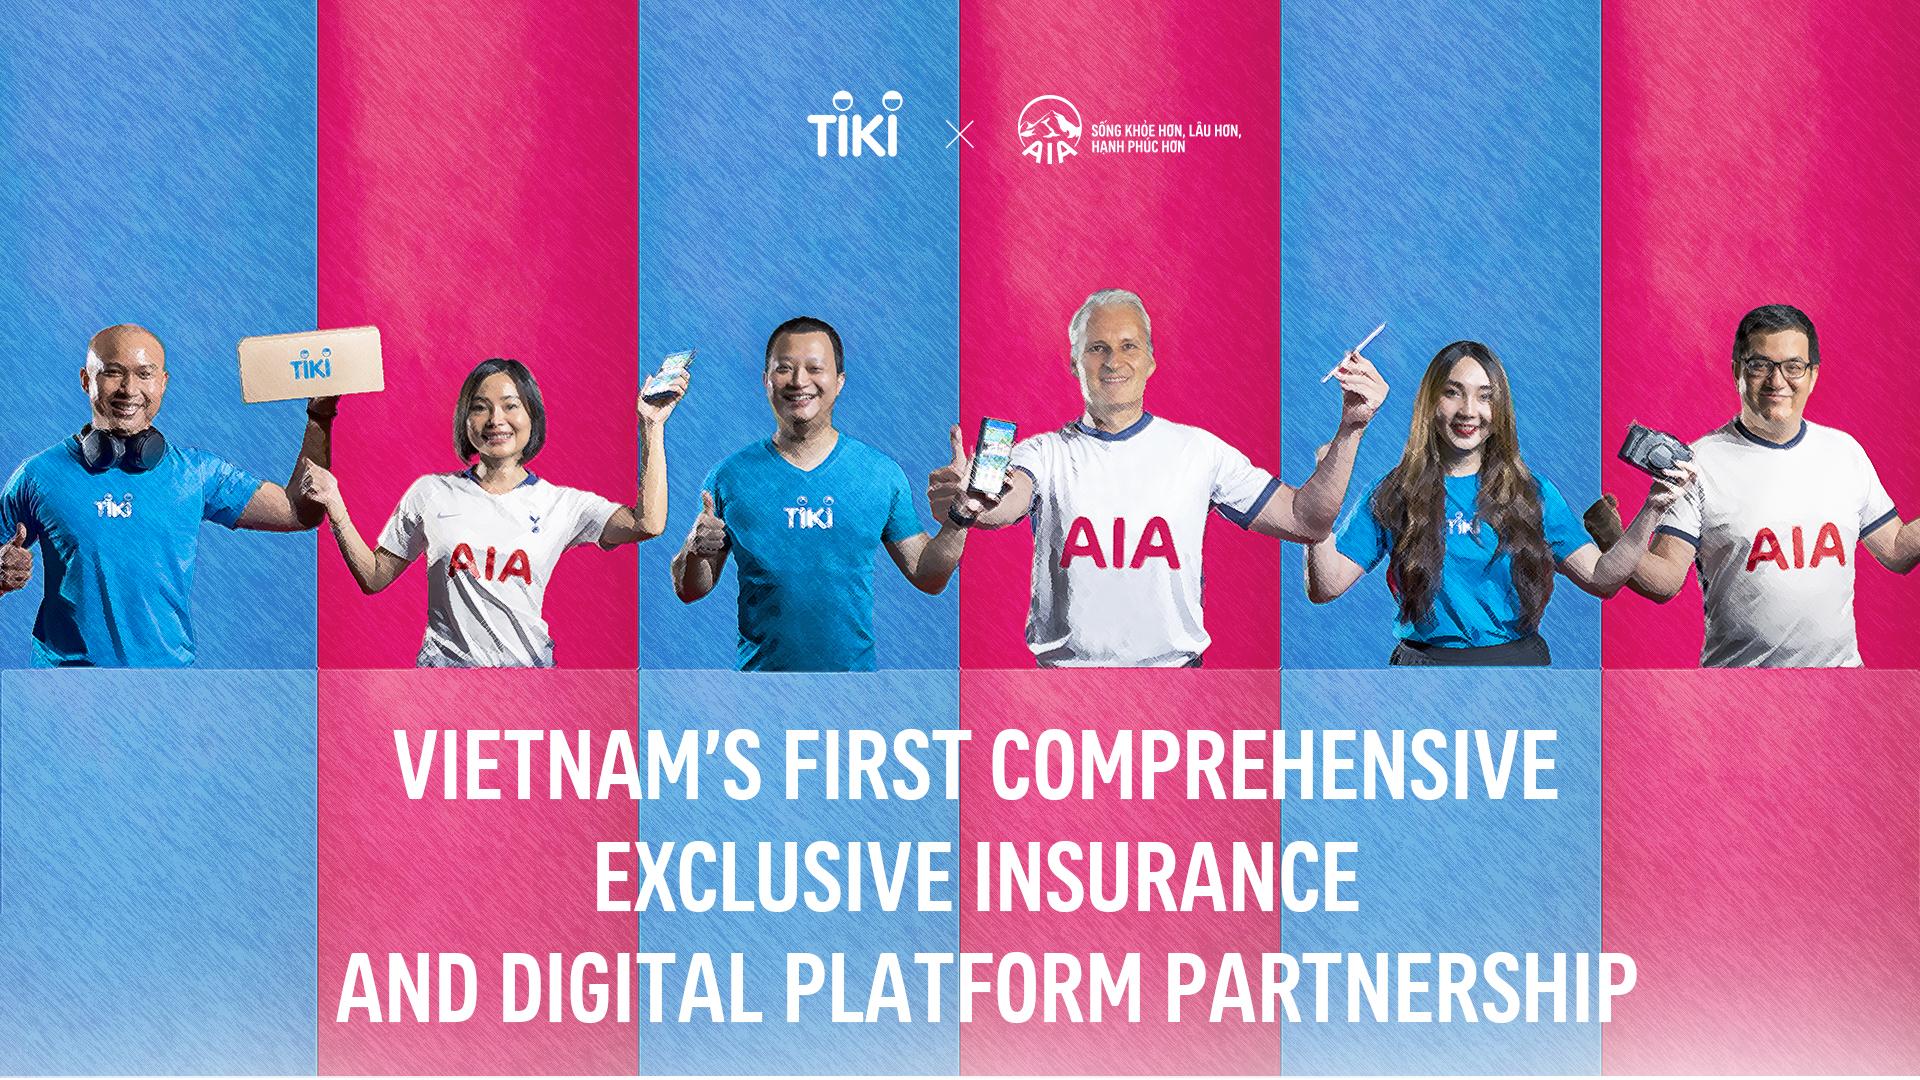 AIA Vietnam and Tiki announce Vietnams first comprehensive exclusive insurance and digital platform partnership